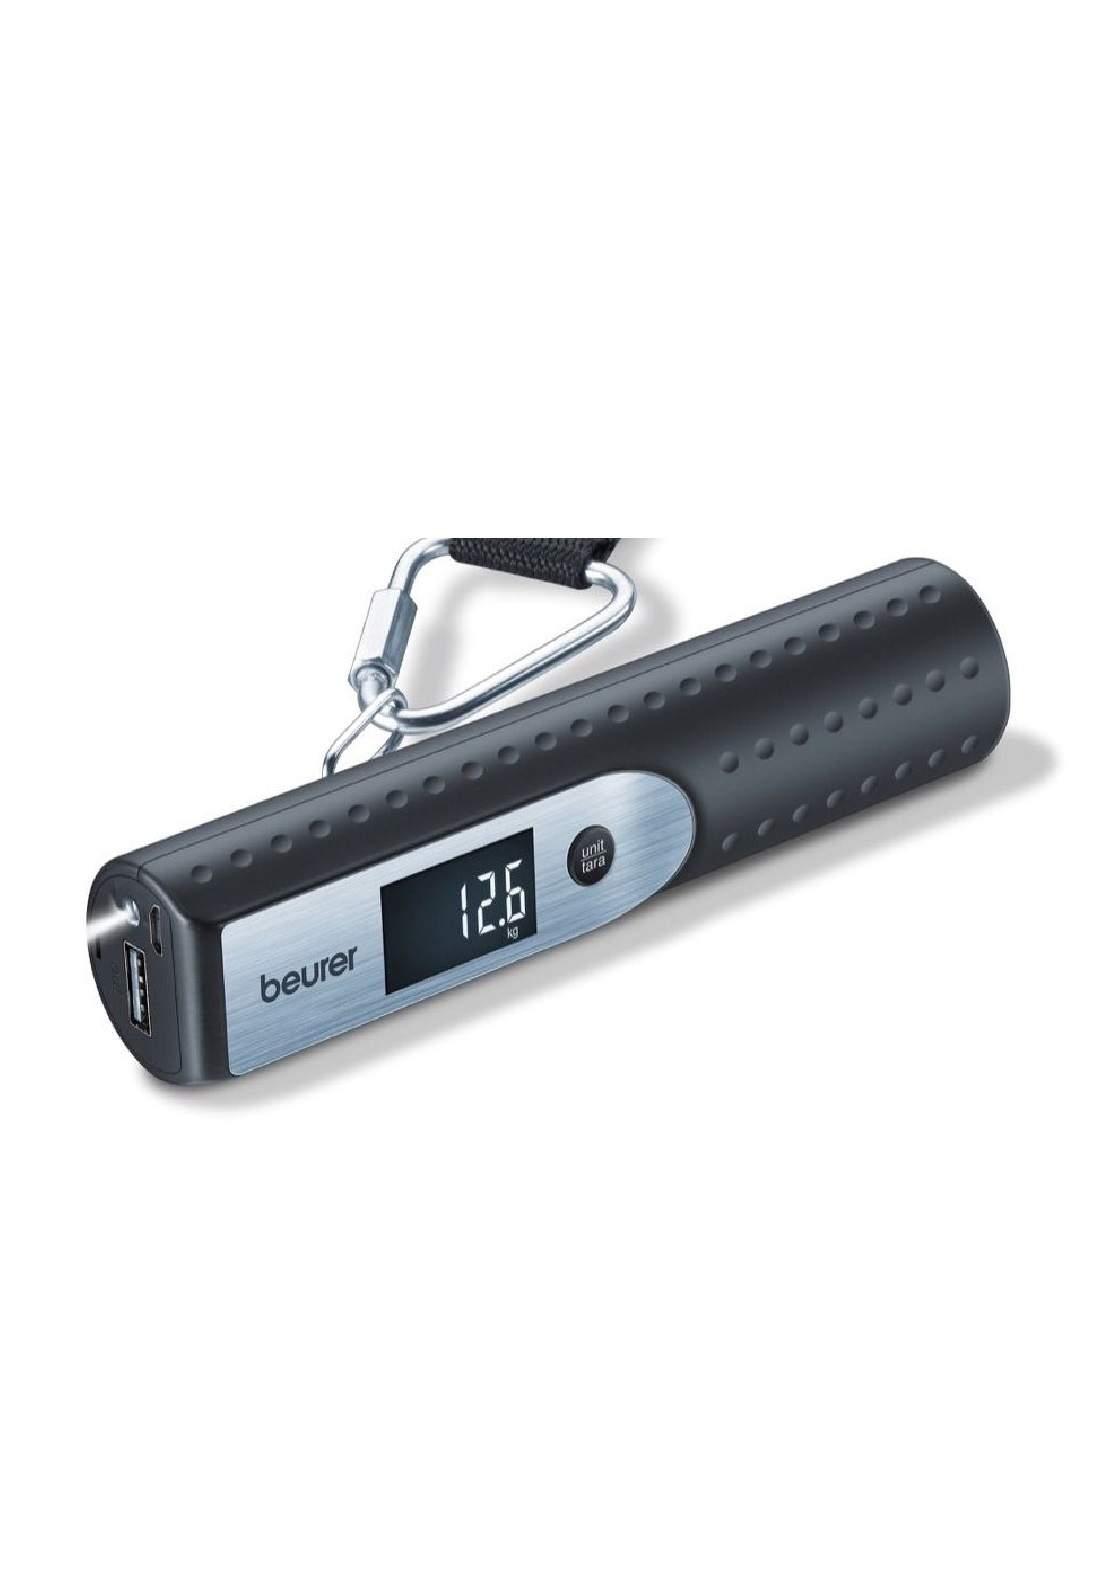 Beurer LS 50 Travelmeister Luggage Scale مقياس لقياس وزن الامتعة